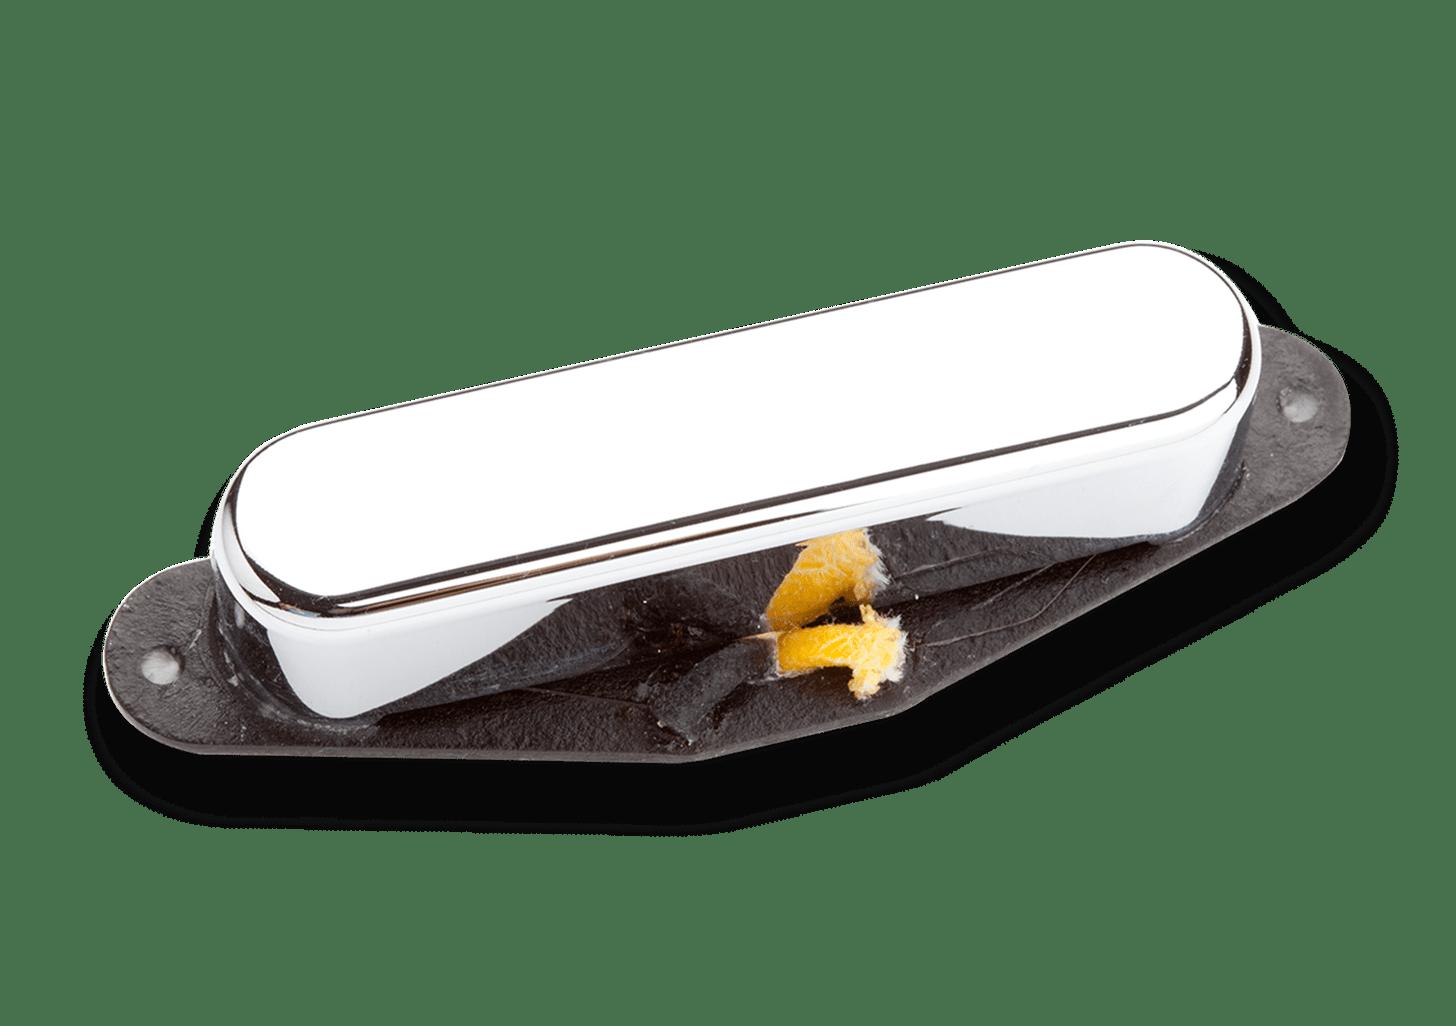 Classic Telecaster Pickups 11202 62